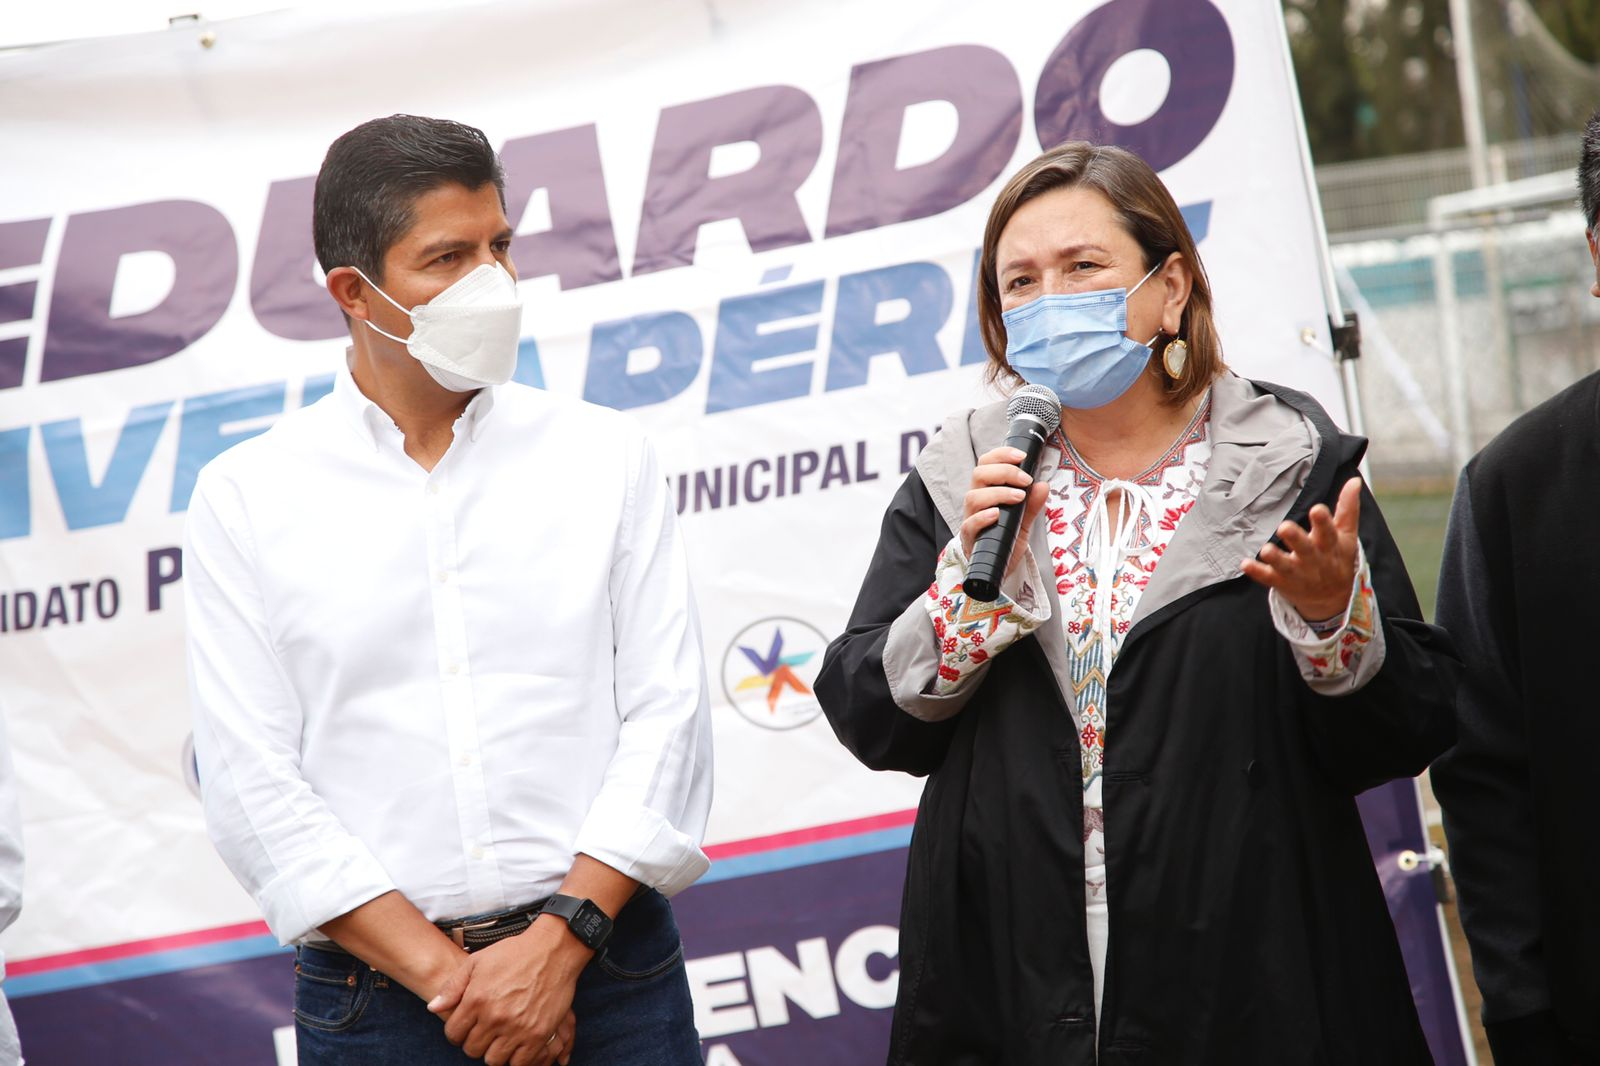 Mil empresas recibirán 25 mil pesos para reactivarse: Eduardo Rivera